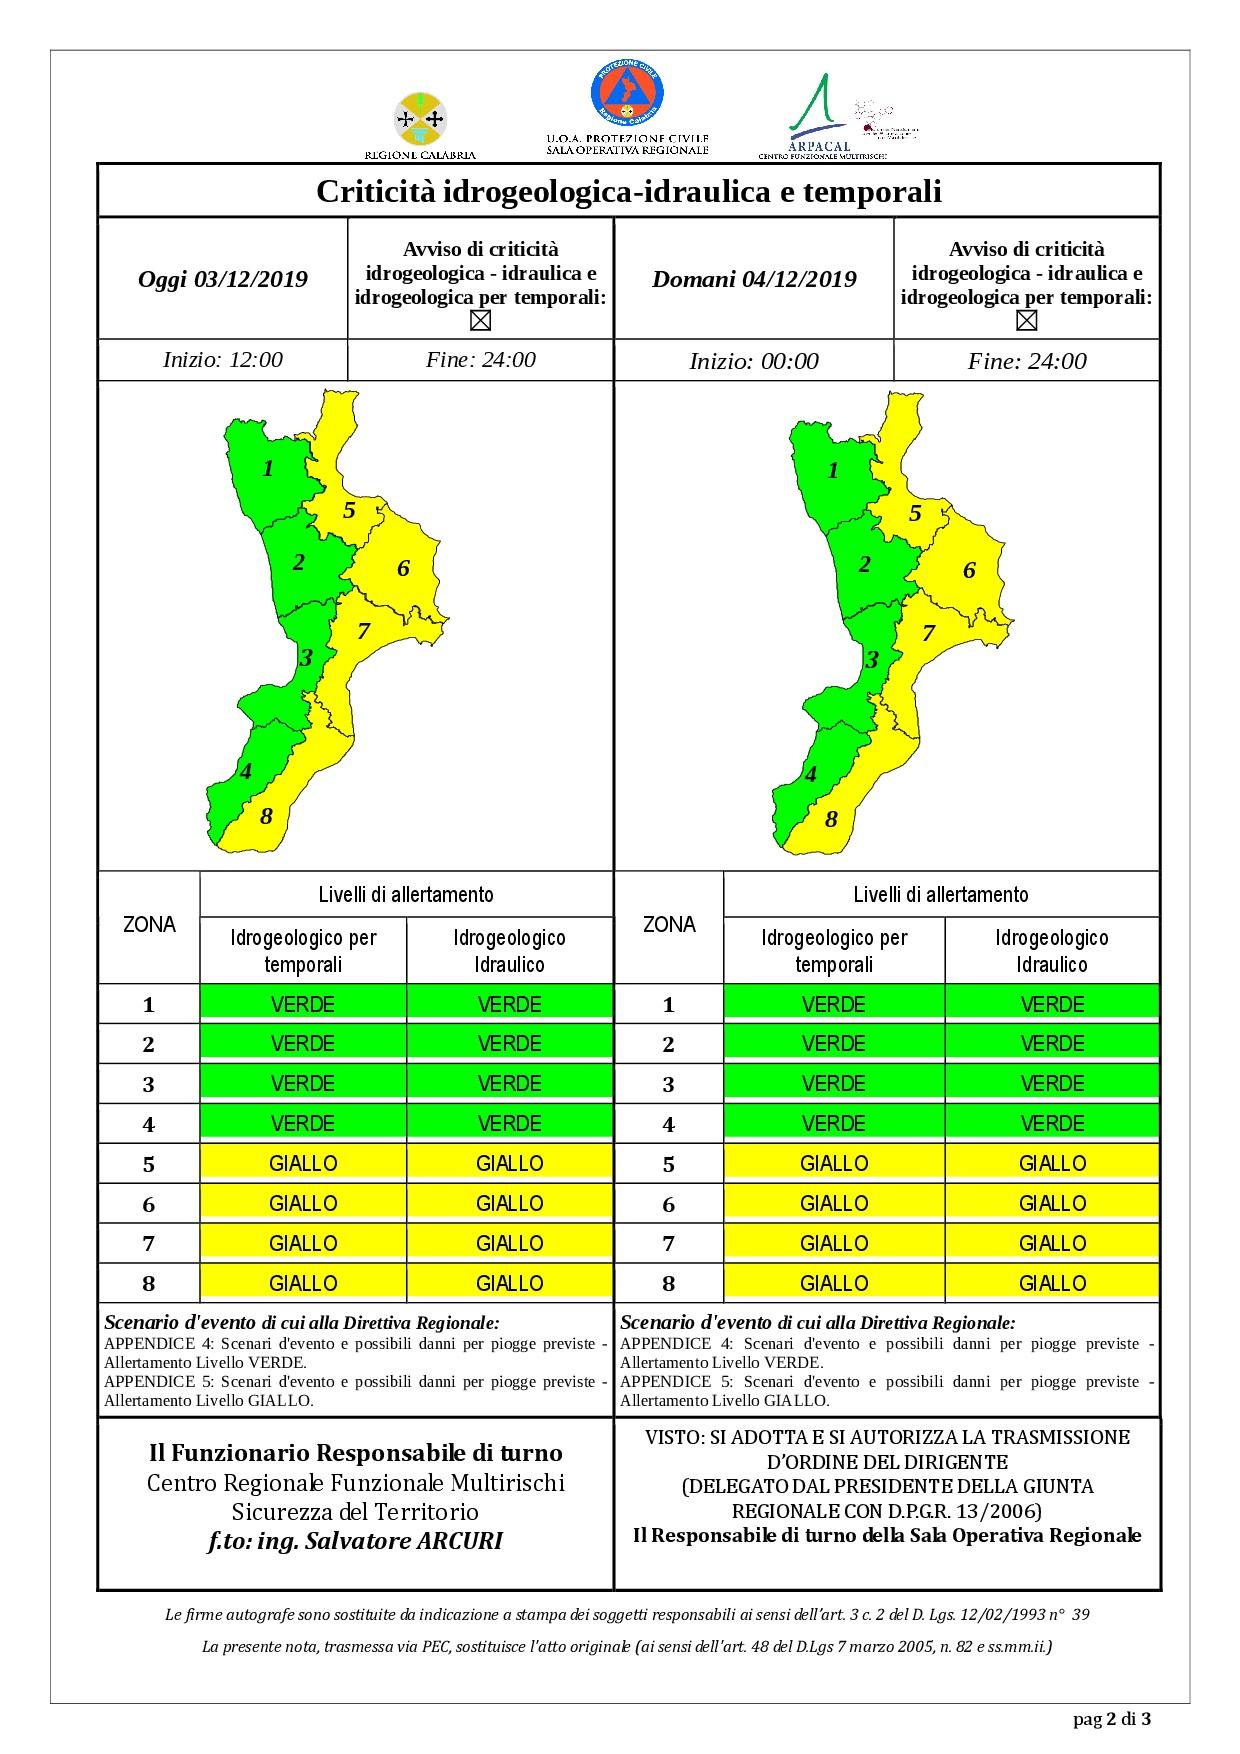 Criticità idrogeologica-idraulica e temporali in Calabria 03-12-2019